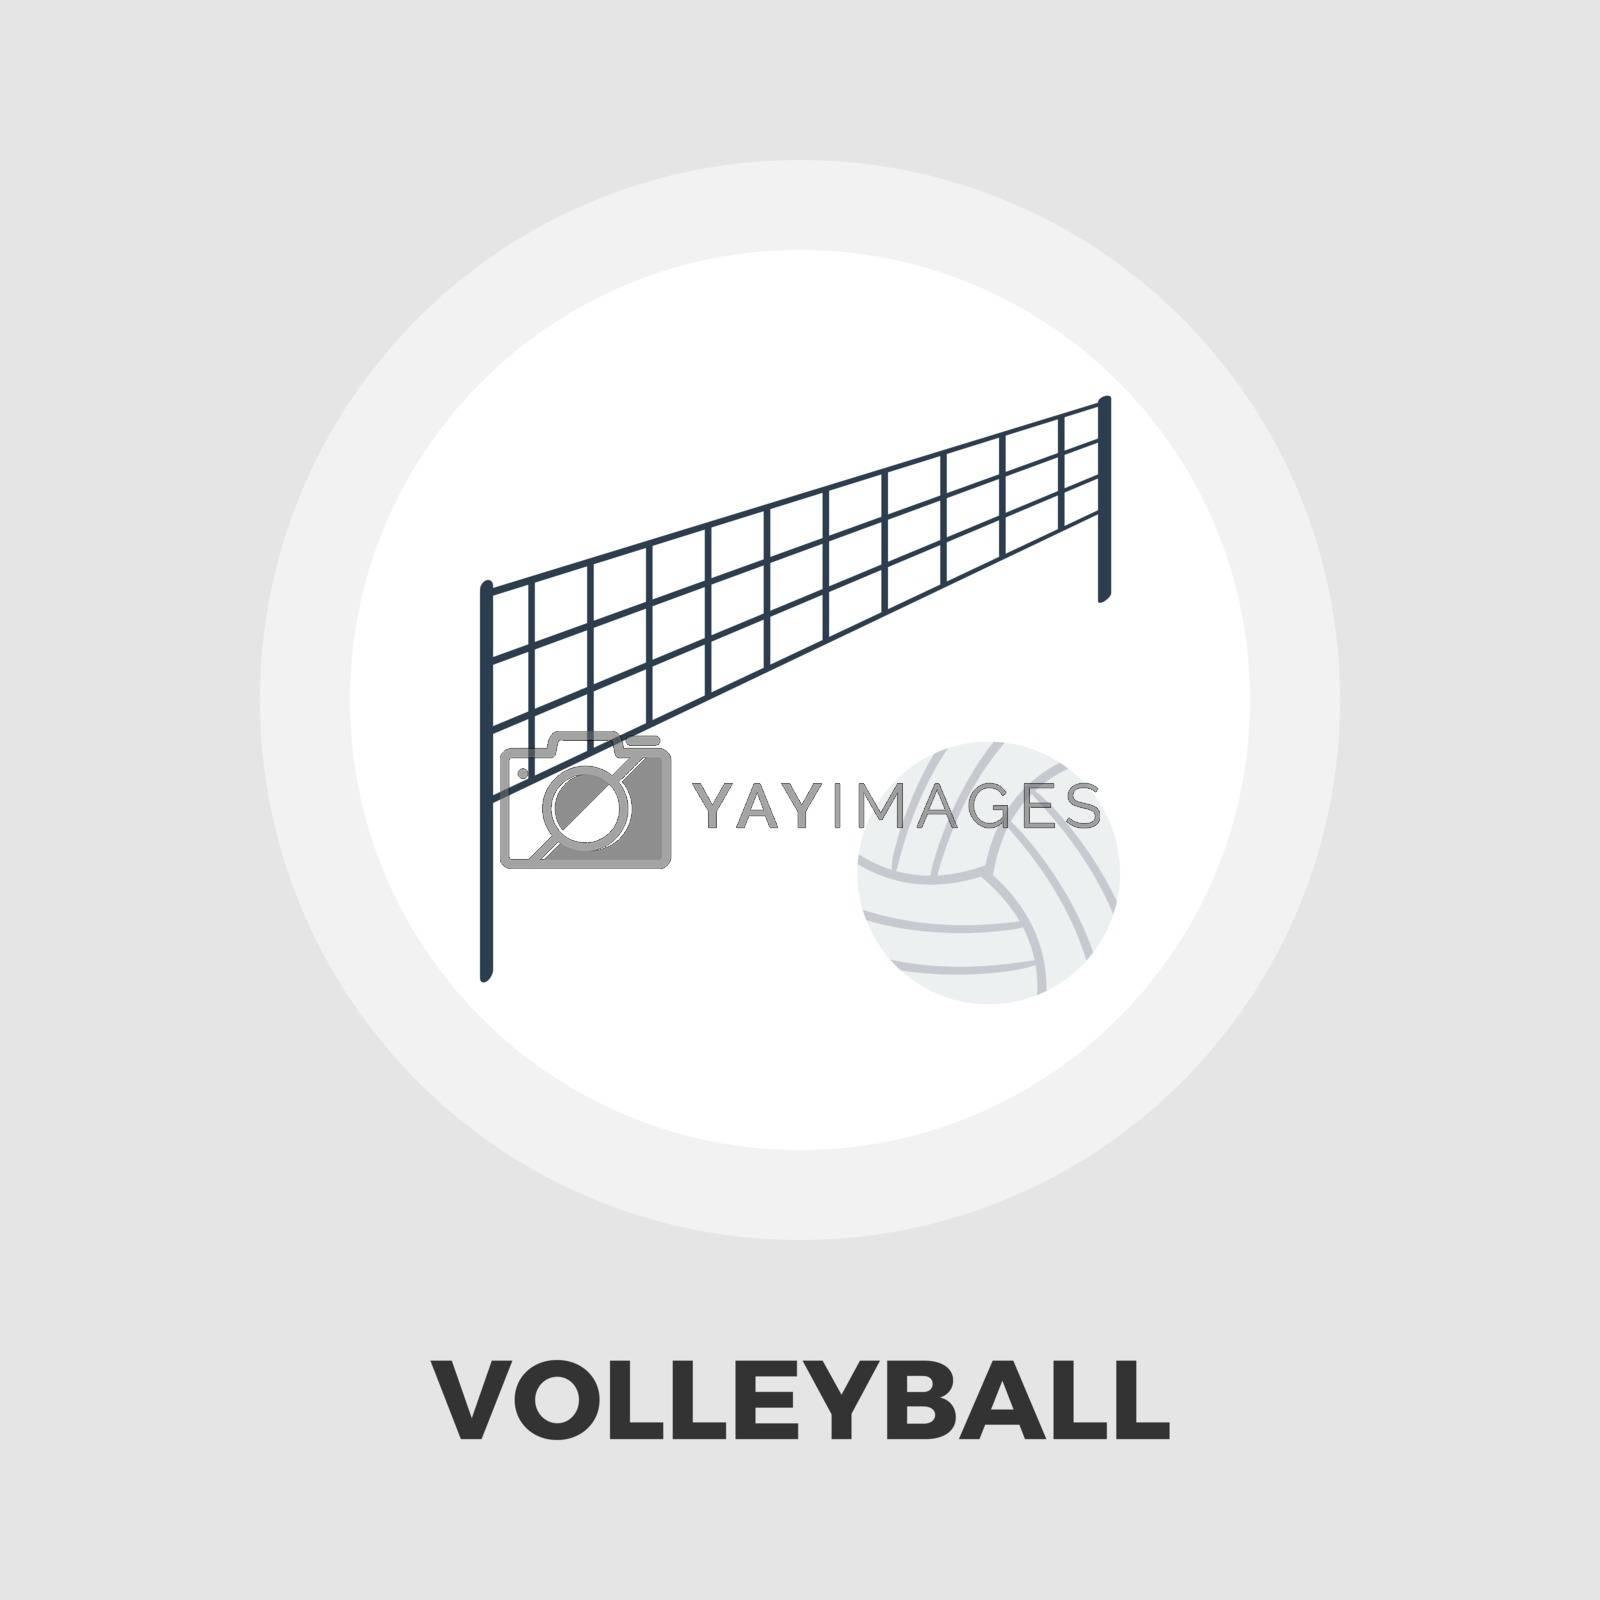 Volleyball icon flat by smoki